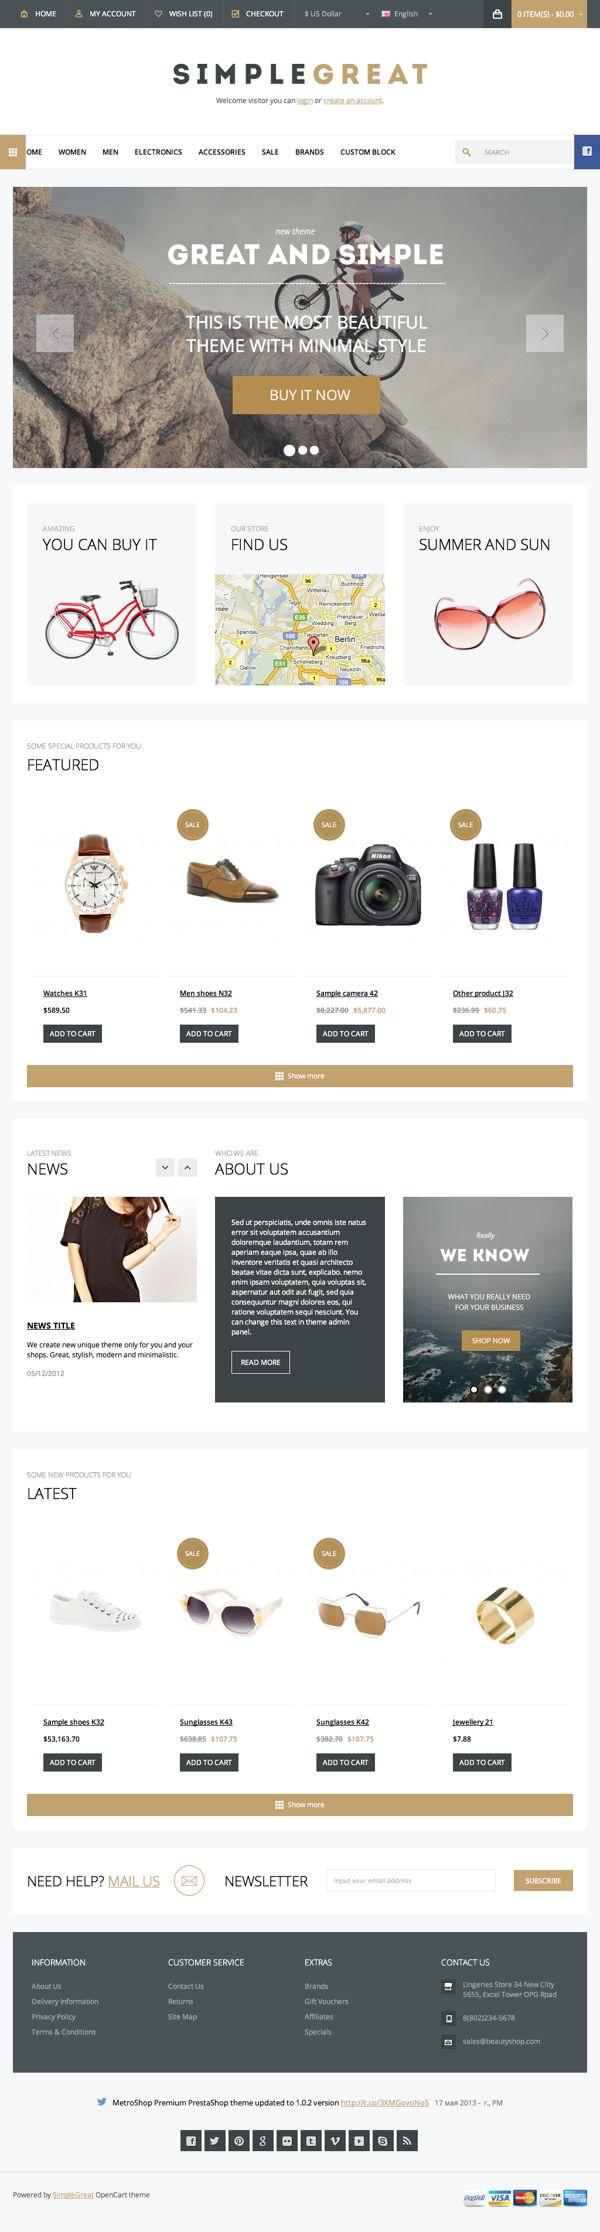 SimpleGreat – Premium Responsive Magento theme! on Web Design Served